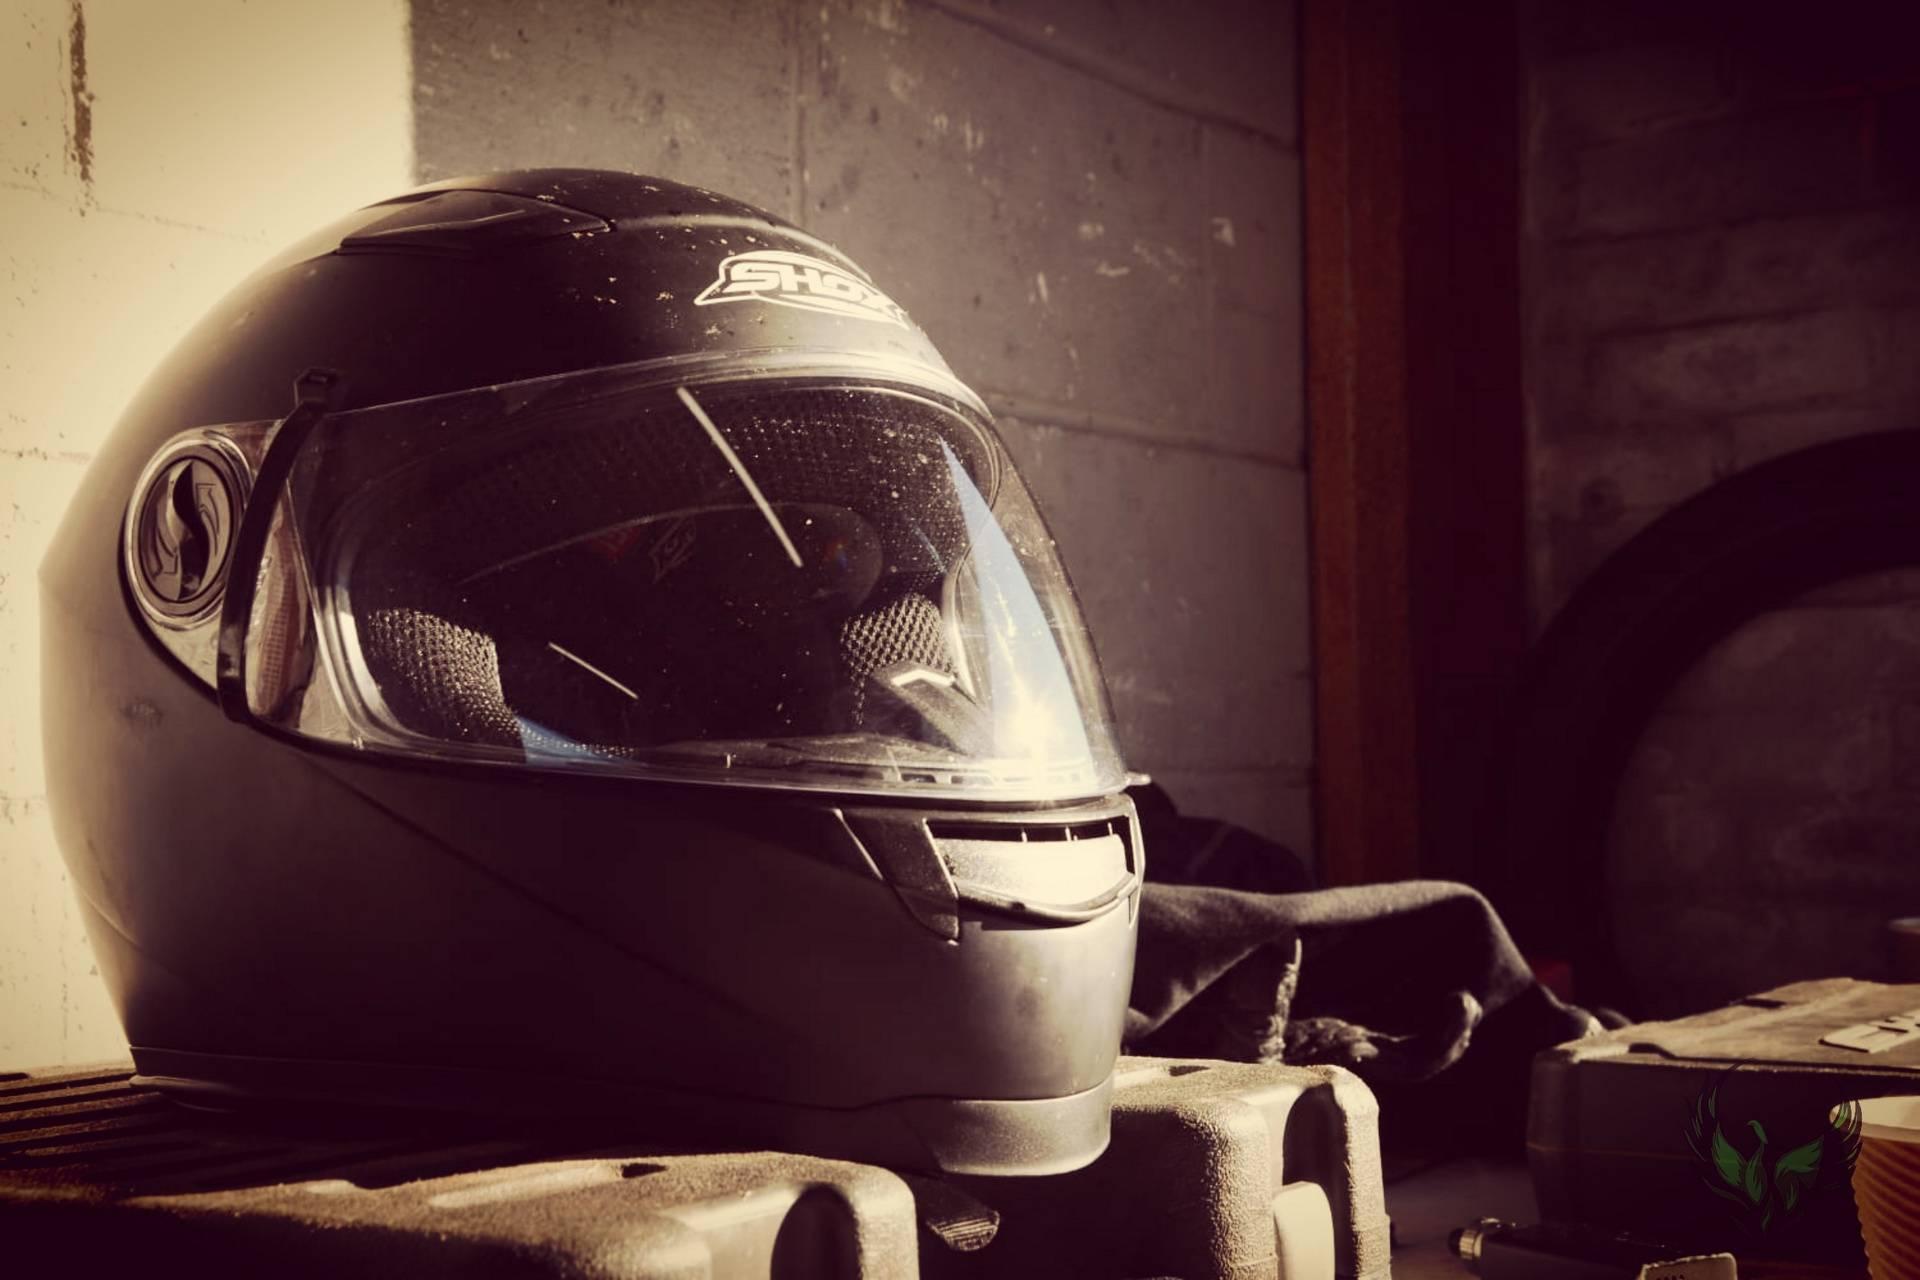 Chris Ganley Helmet